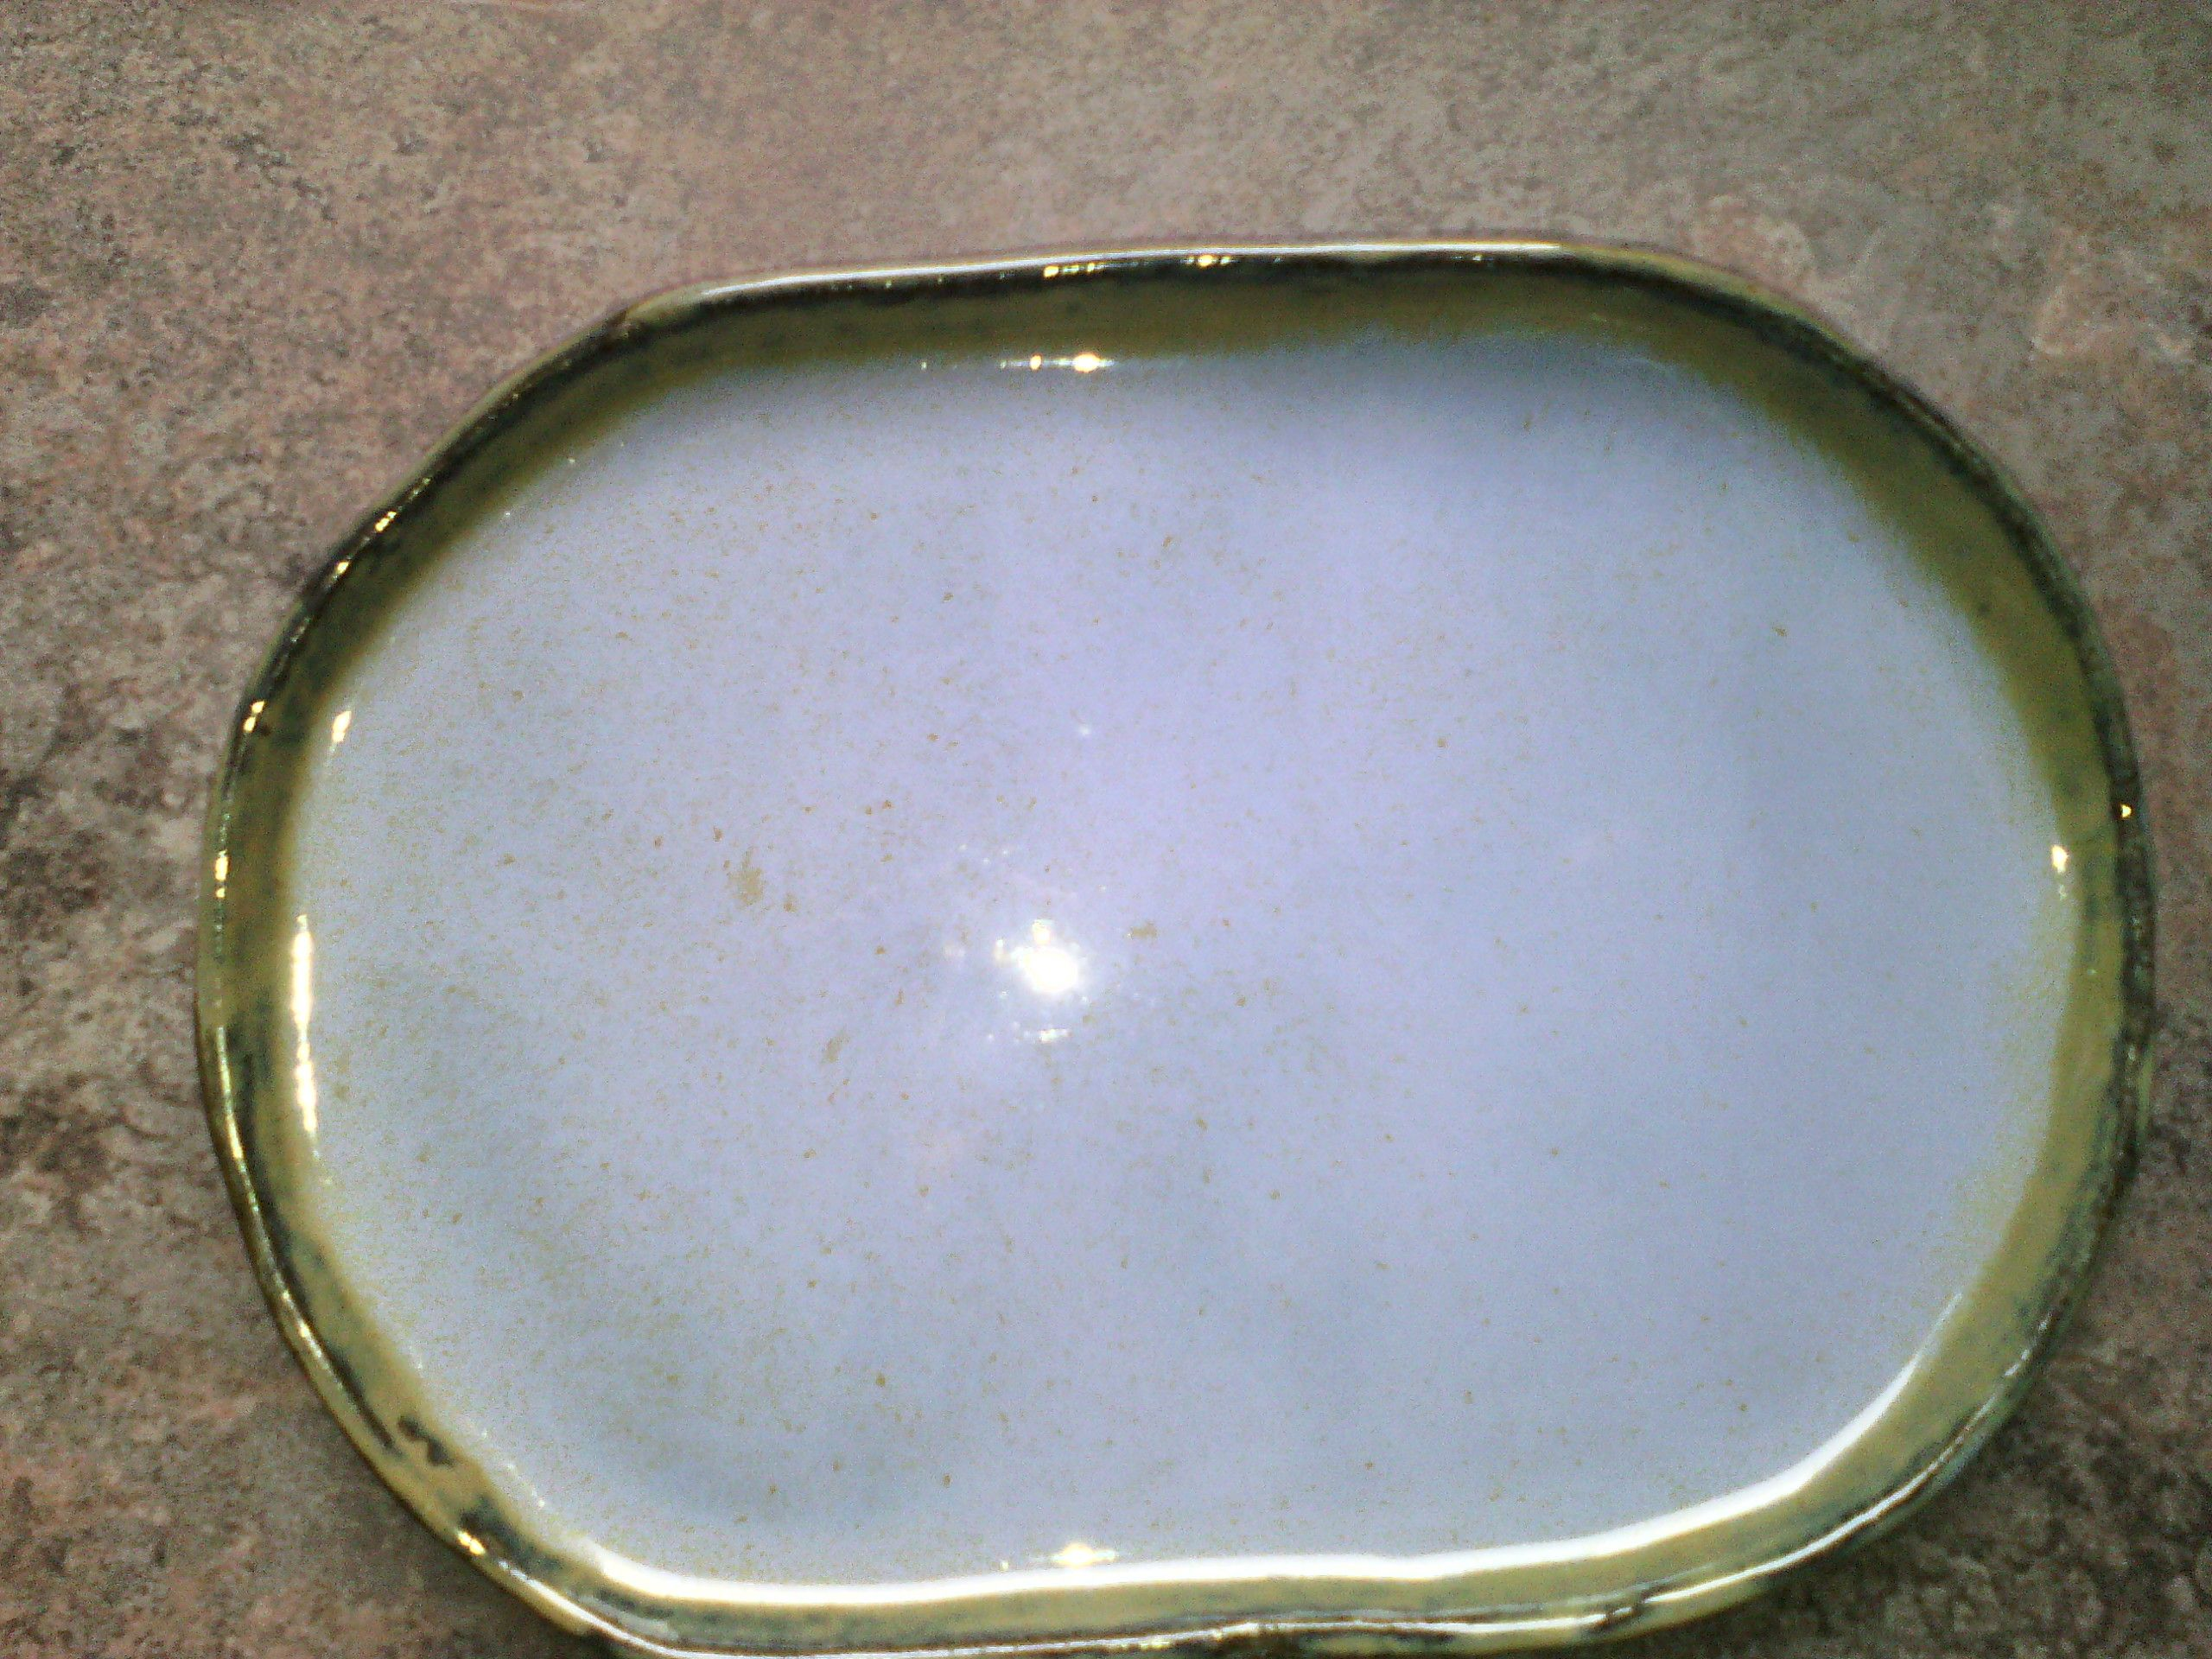 blue/green glaze on white clay